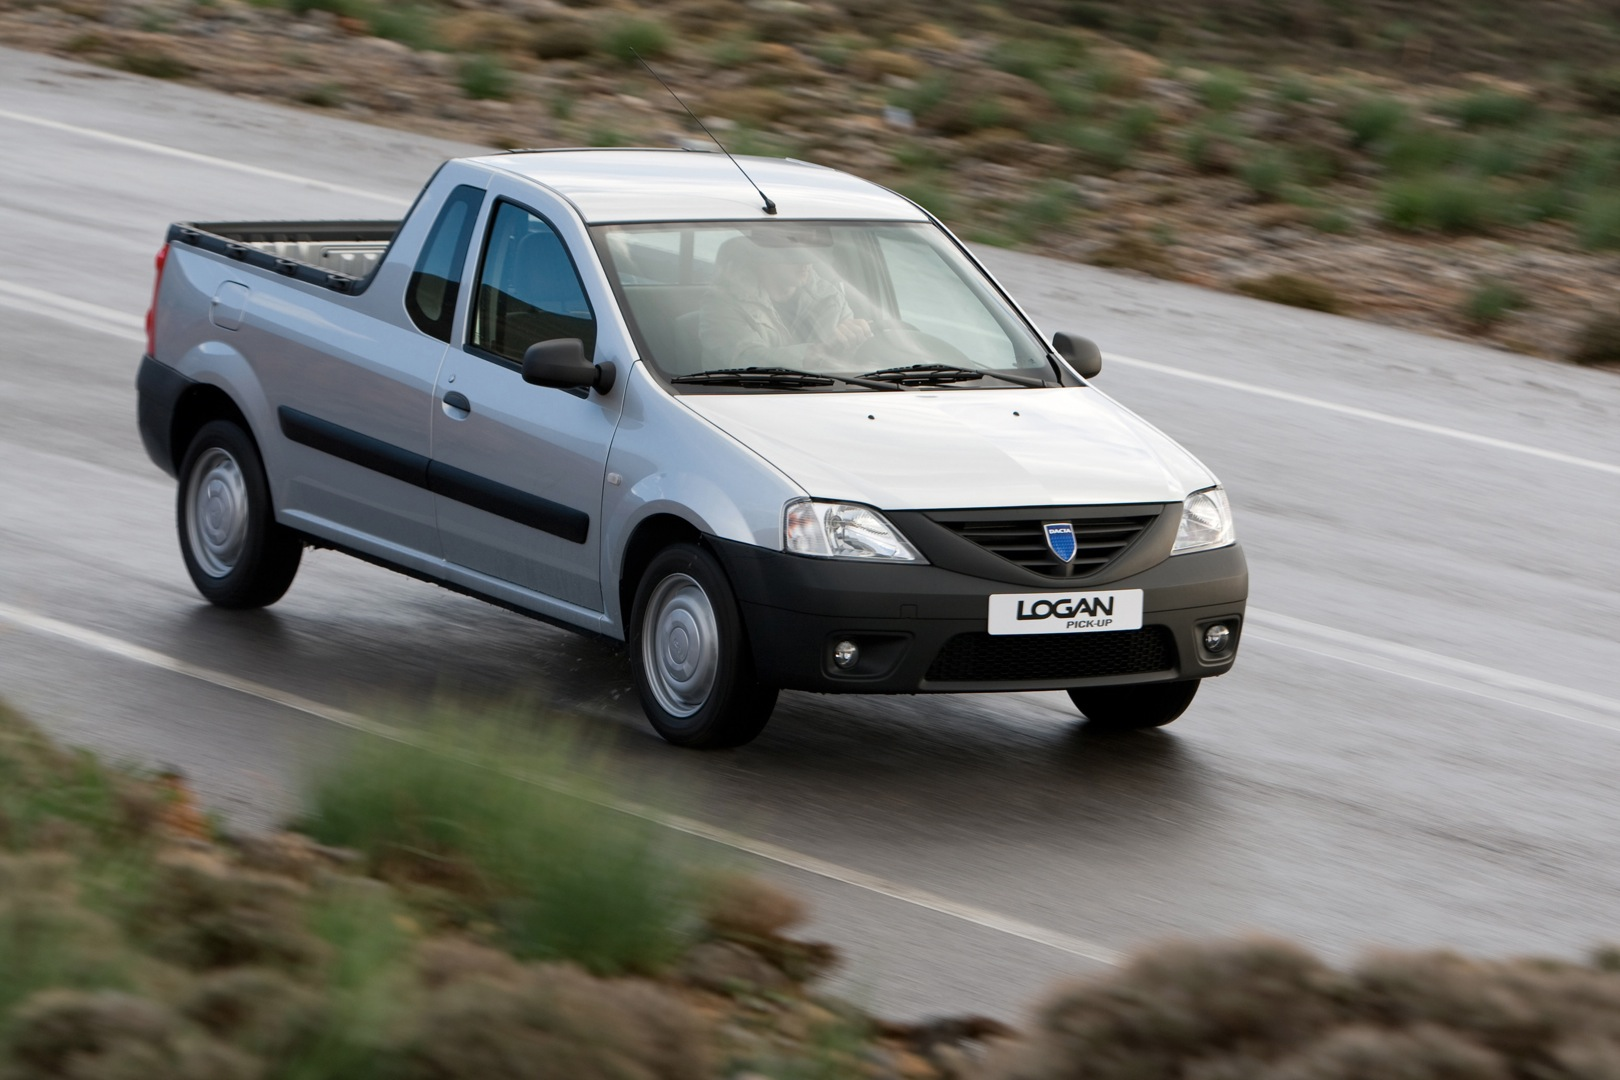 Dacia Logan  Pick-up 2007 DACIAPick-up-4554_2